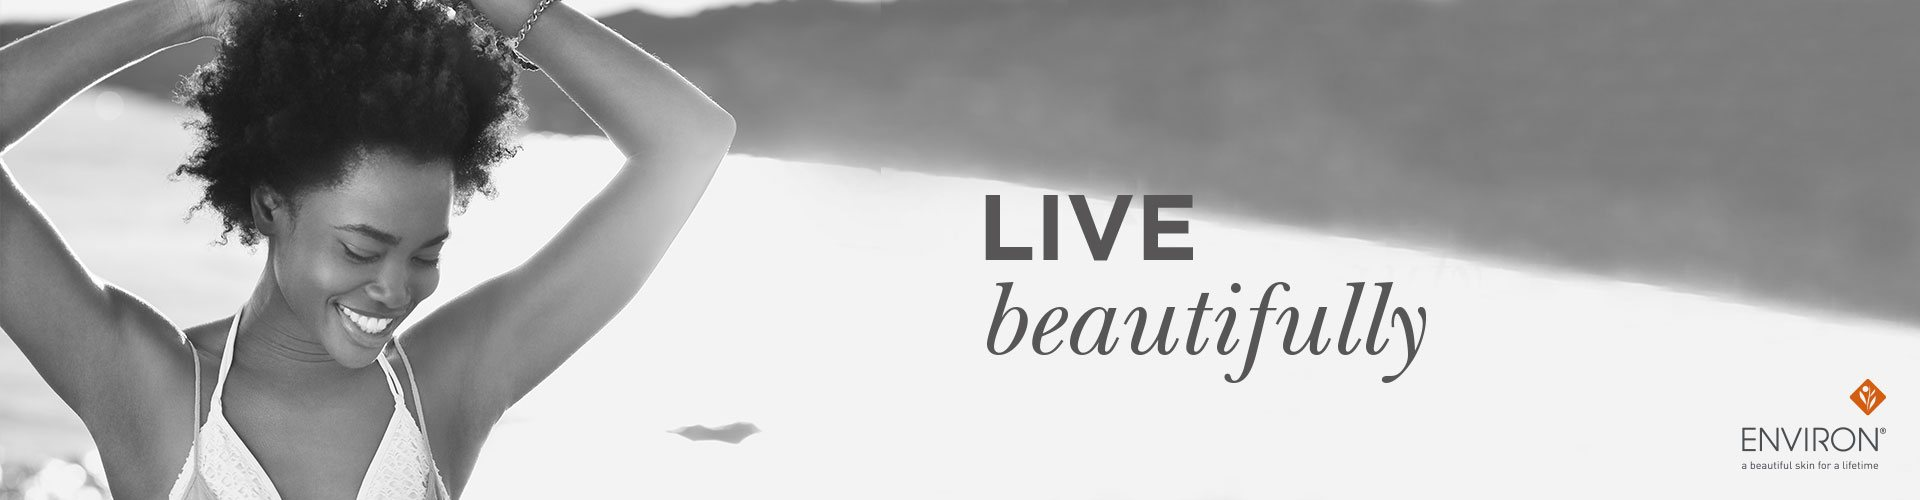 Environ - Live Beautifully